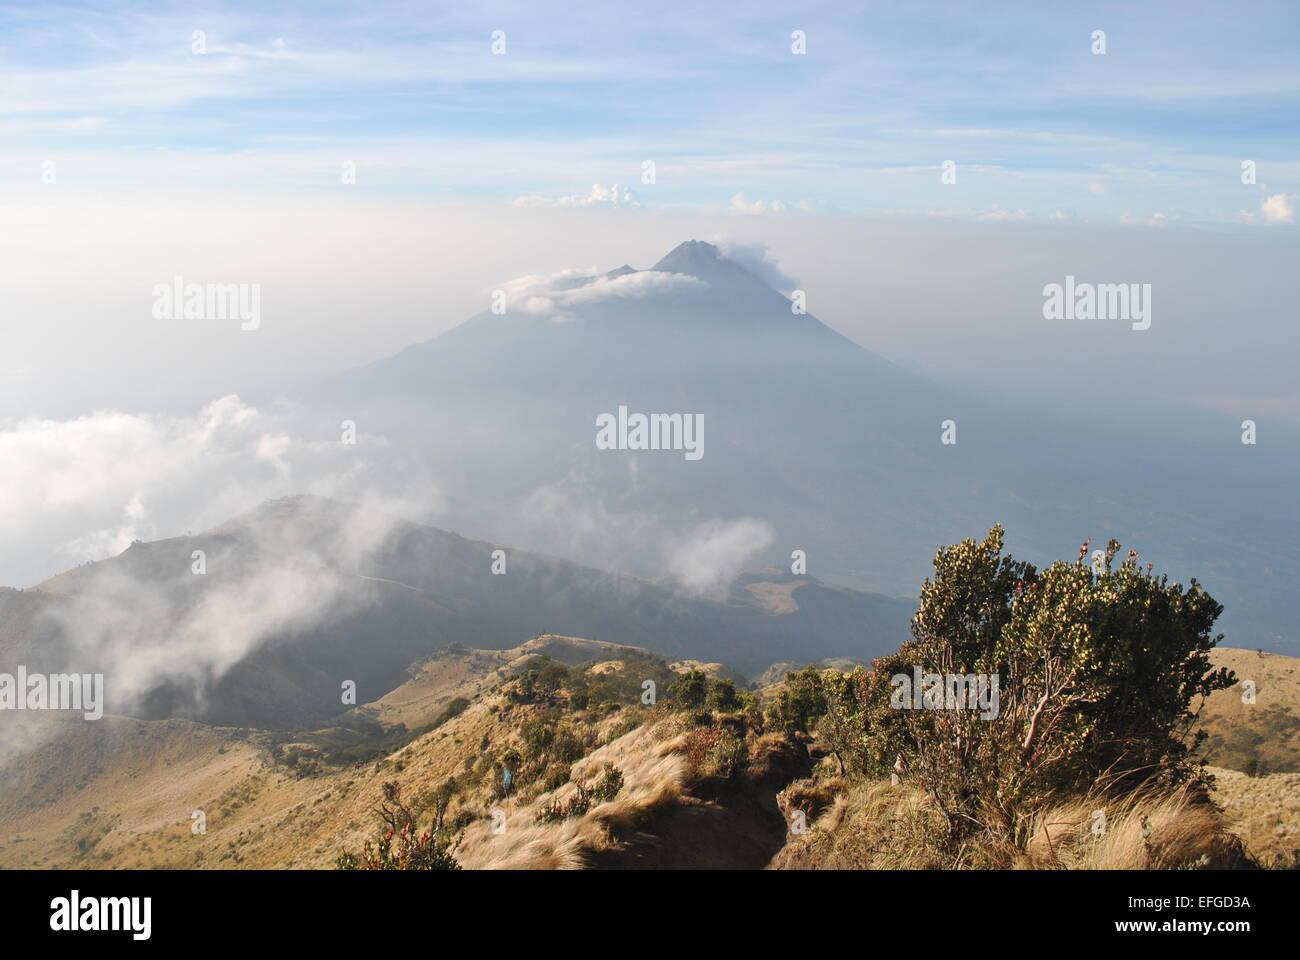 Gunung Merapi, Central Java, Indonesia - Stock Image